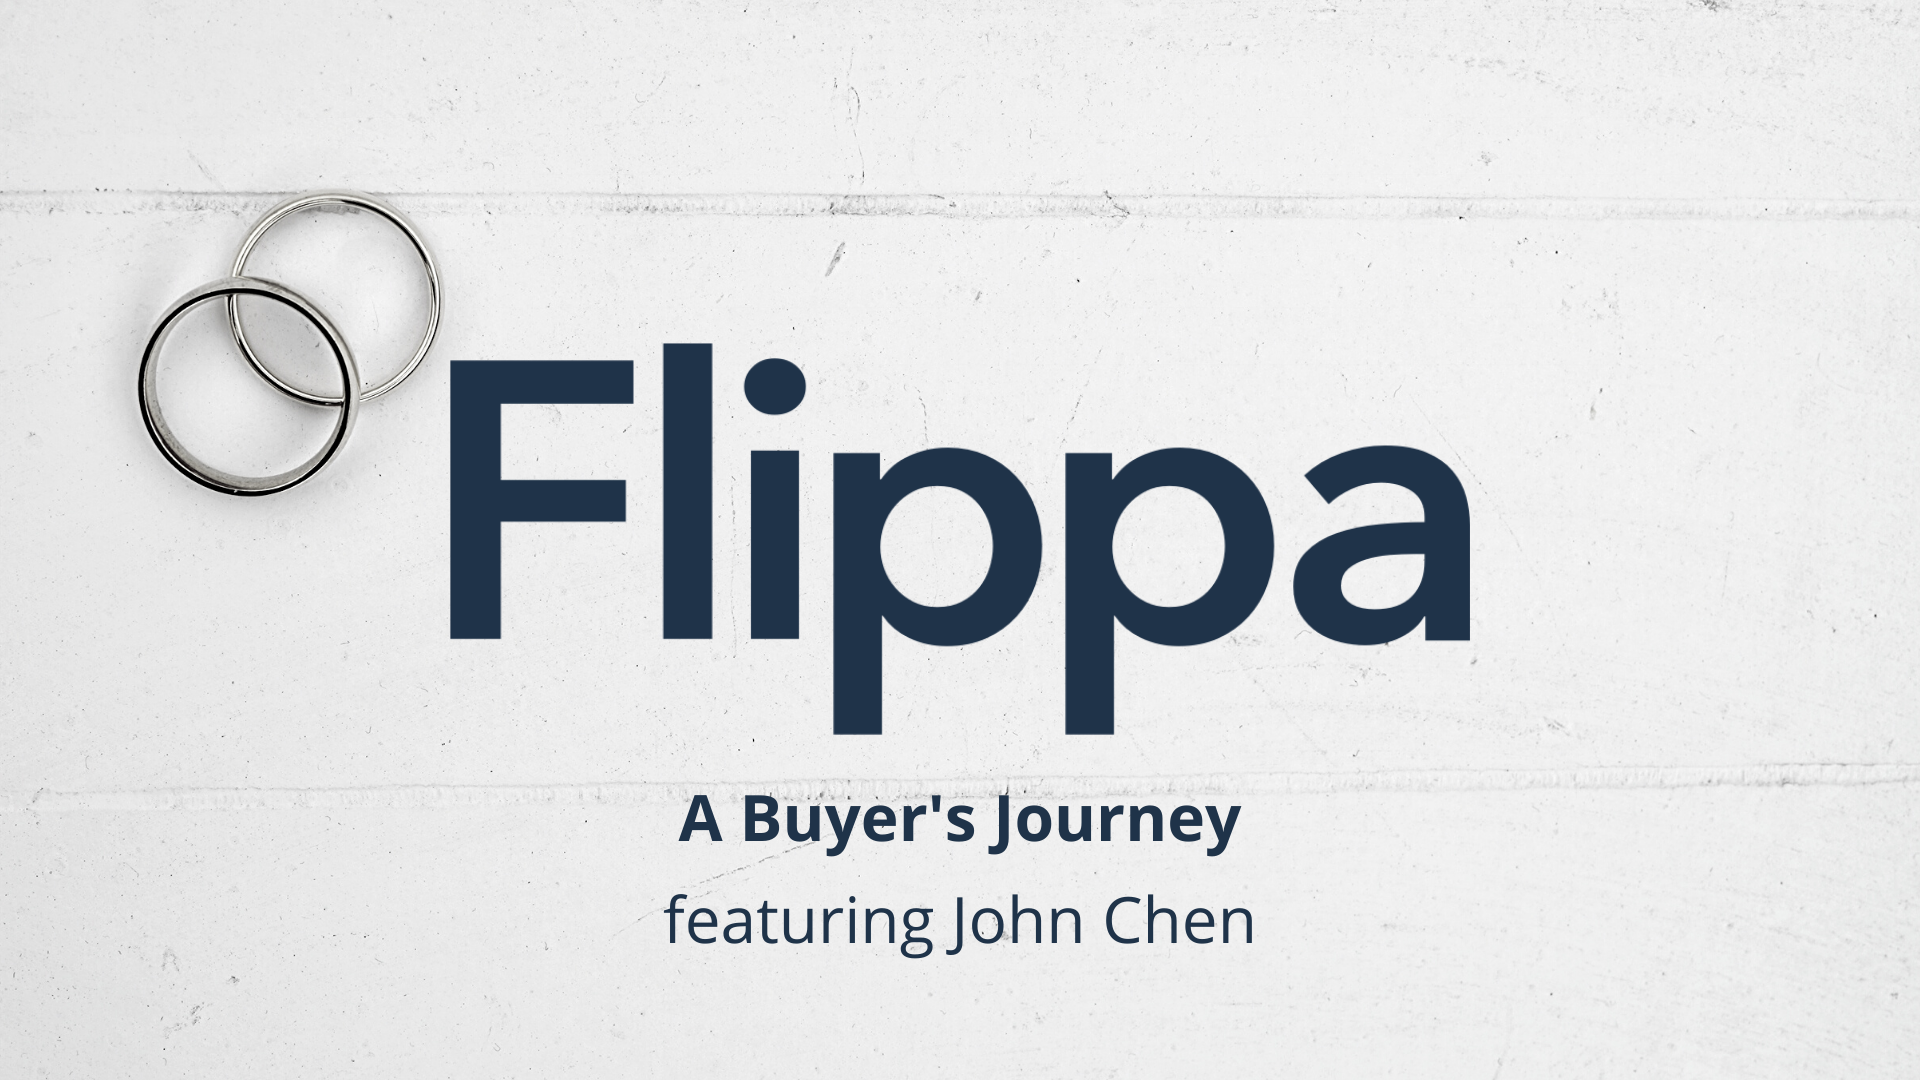 The Flippa Buyer's Journey featuring John Chen